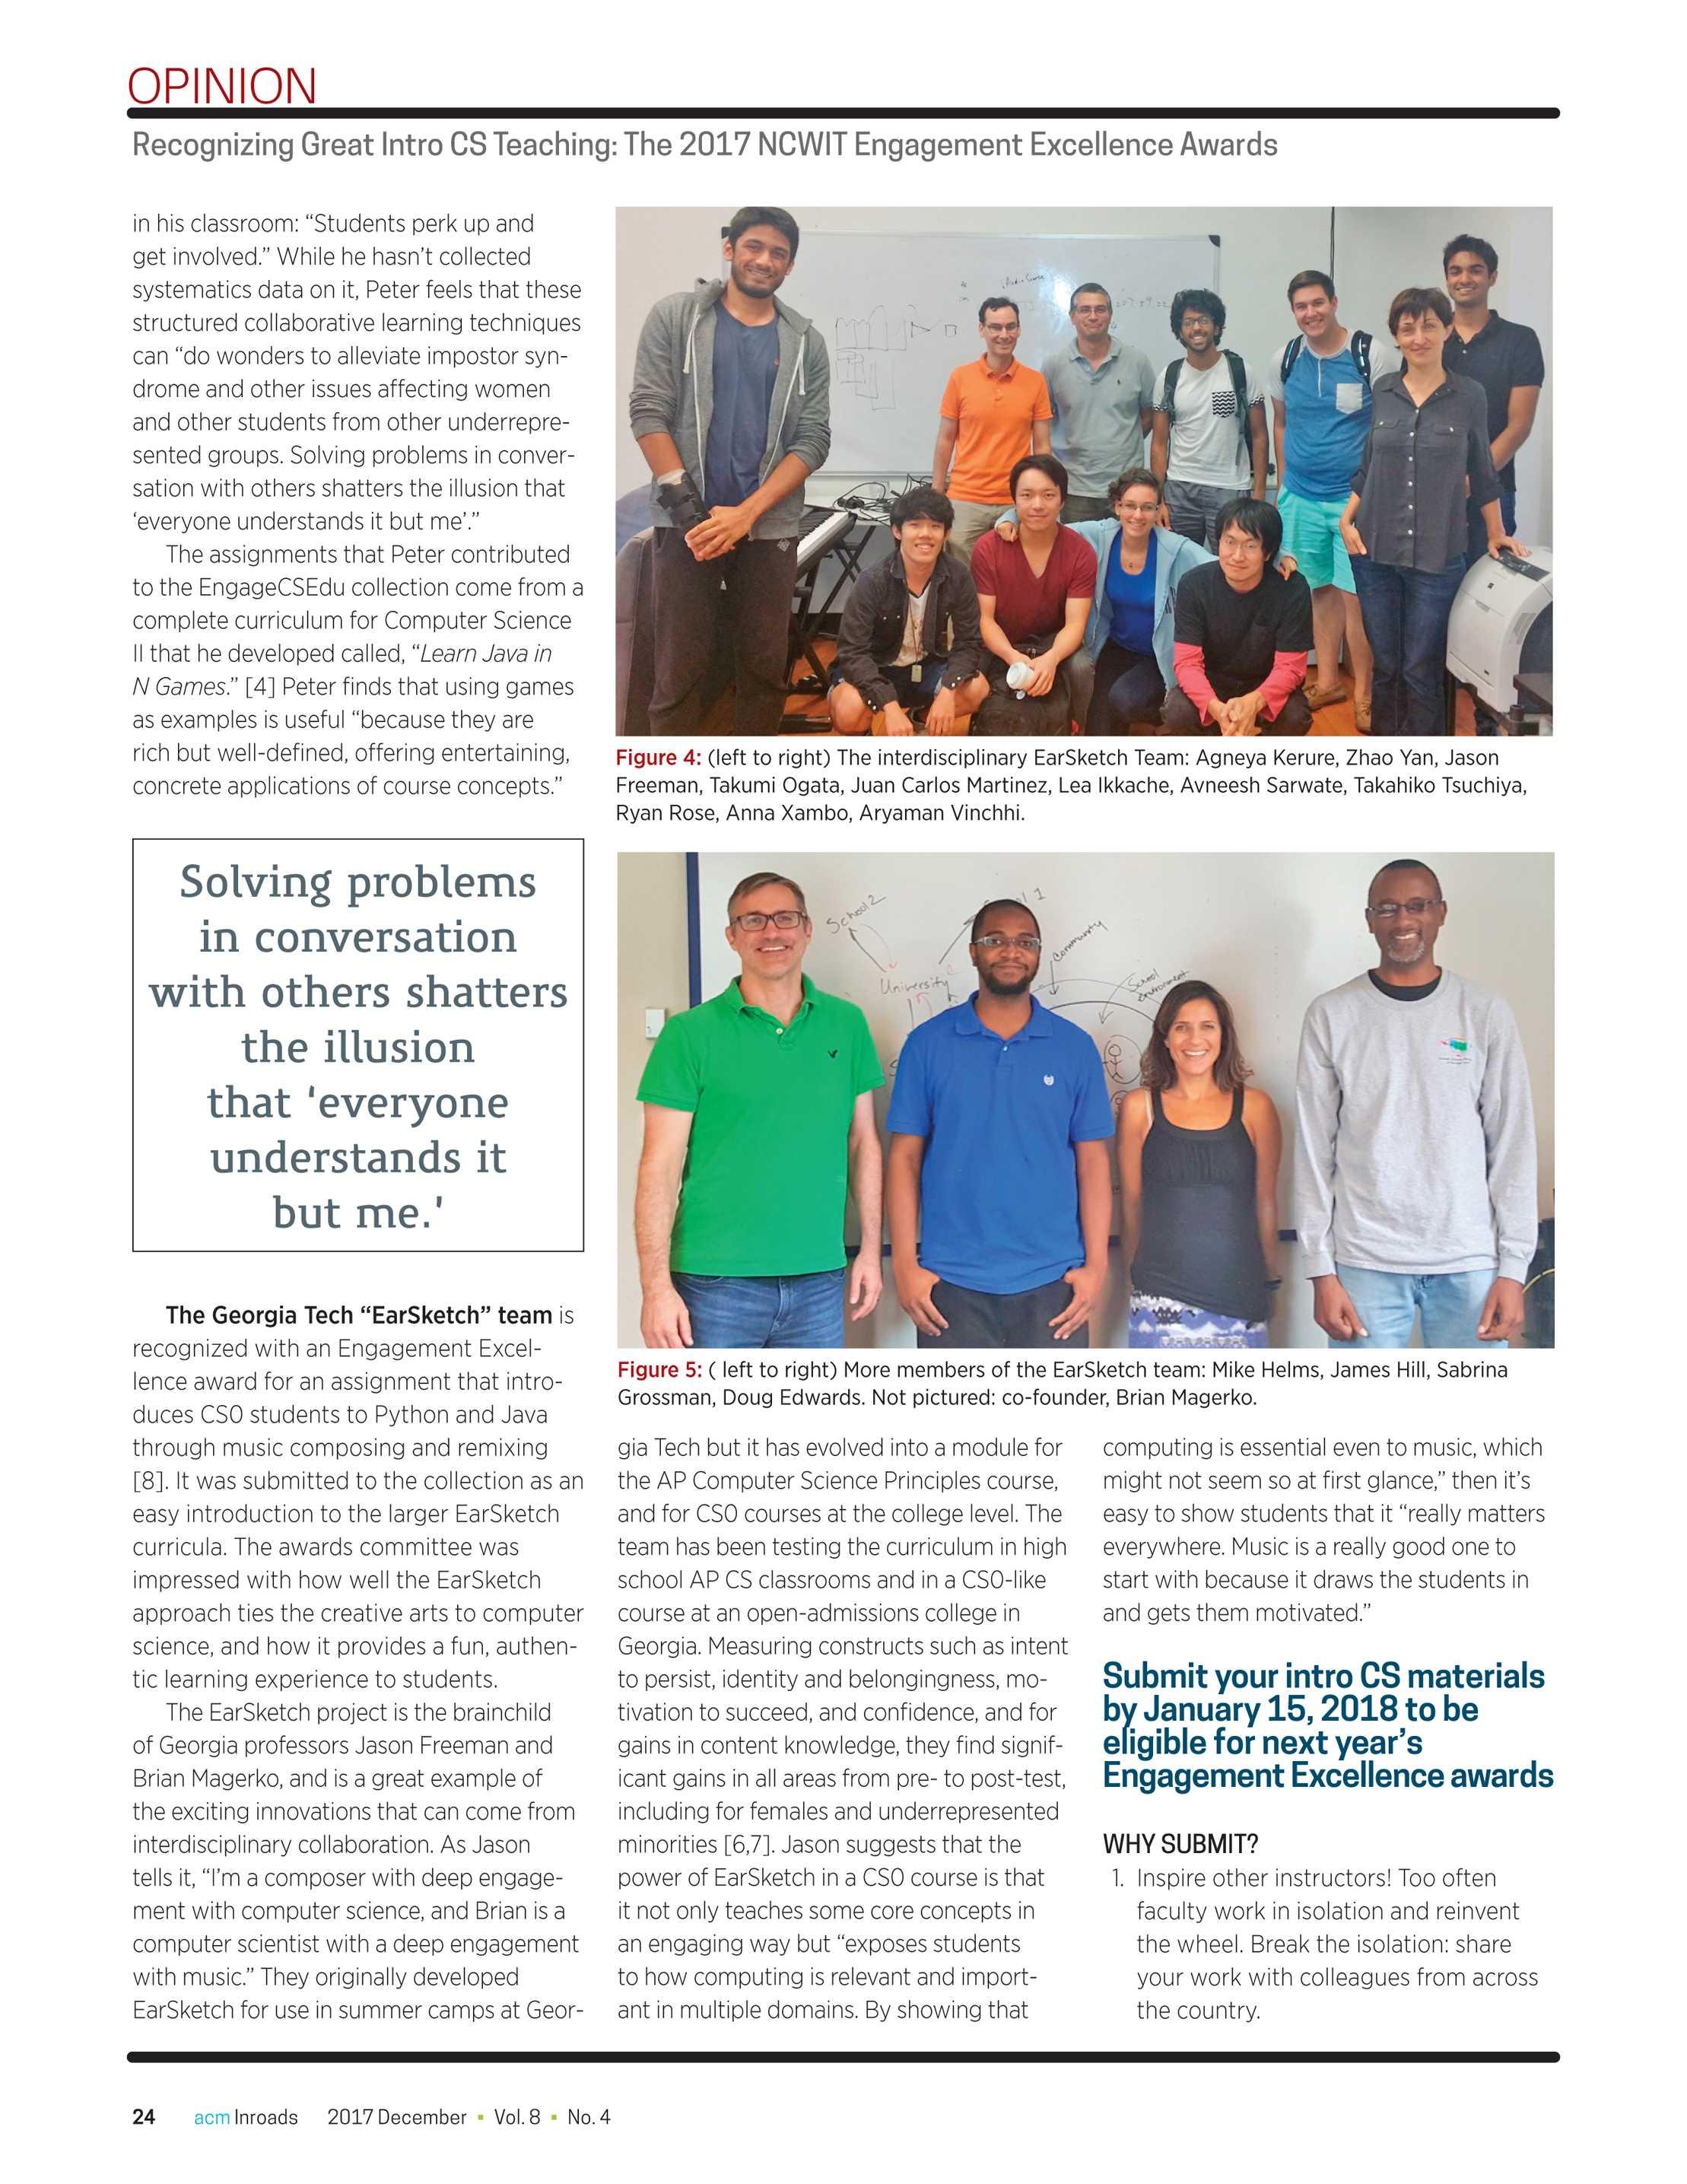 Inroads - December 2017 - page 24